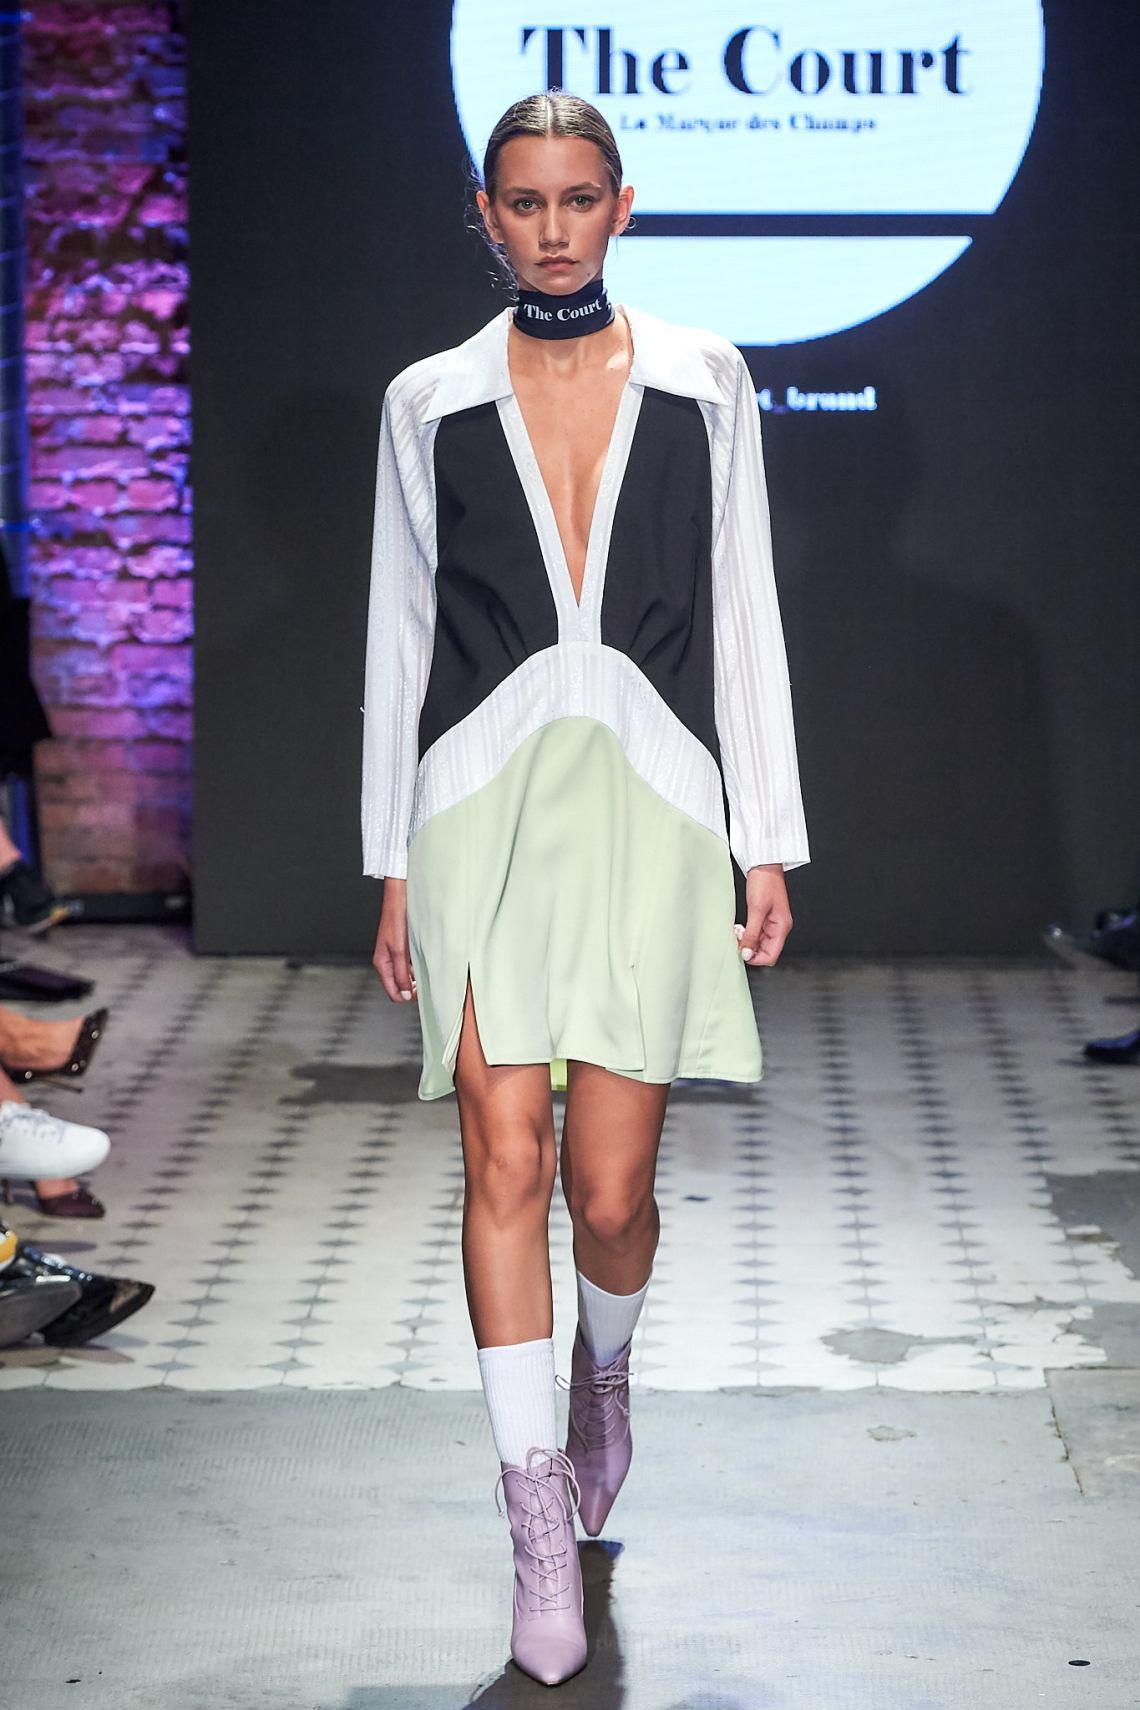 1_KTW_DAY2_121019_FUSIECKA_lowres-fotFilipOkopny-FashionImages